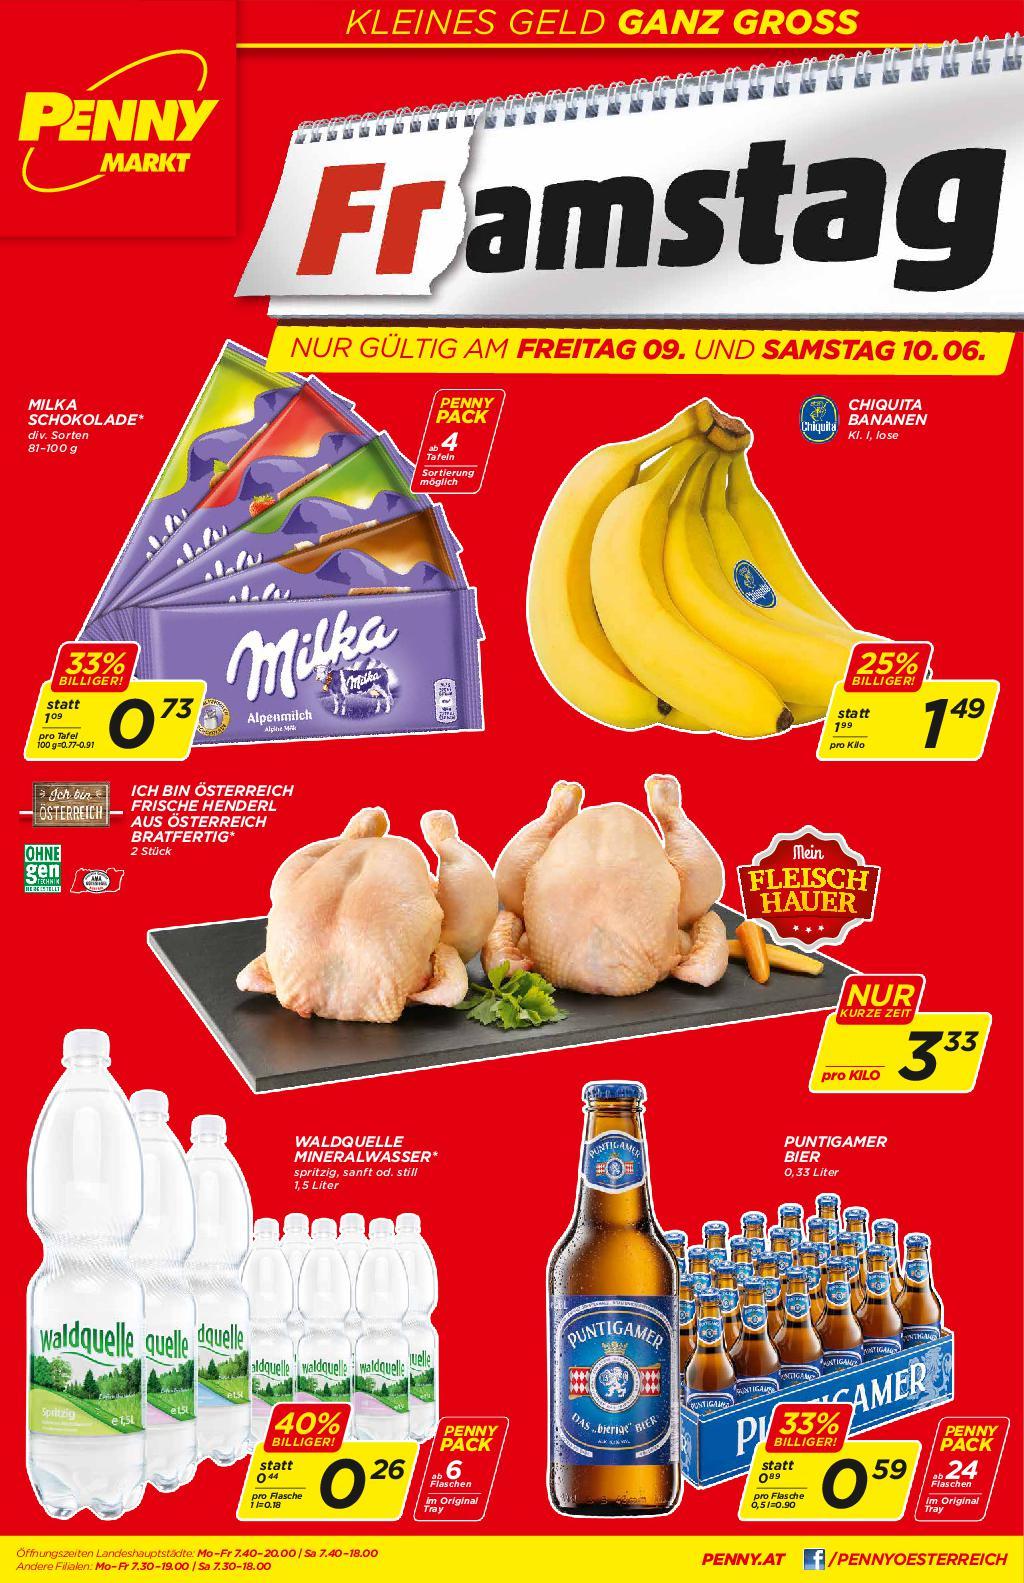 [Penny] MILKA Alpenmilch für 0,73 € pro Tafel ab 4 Stück